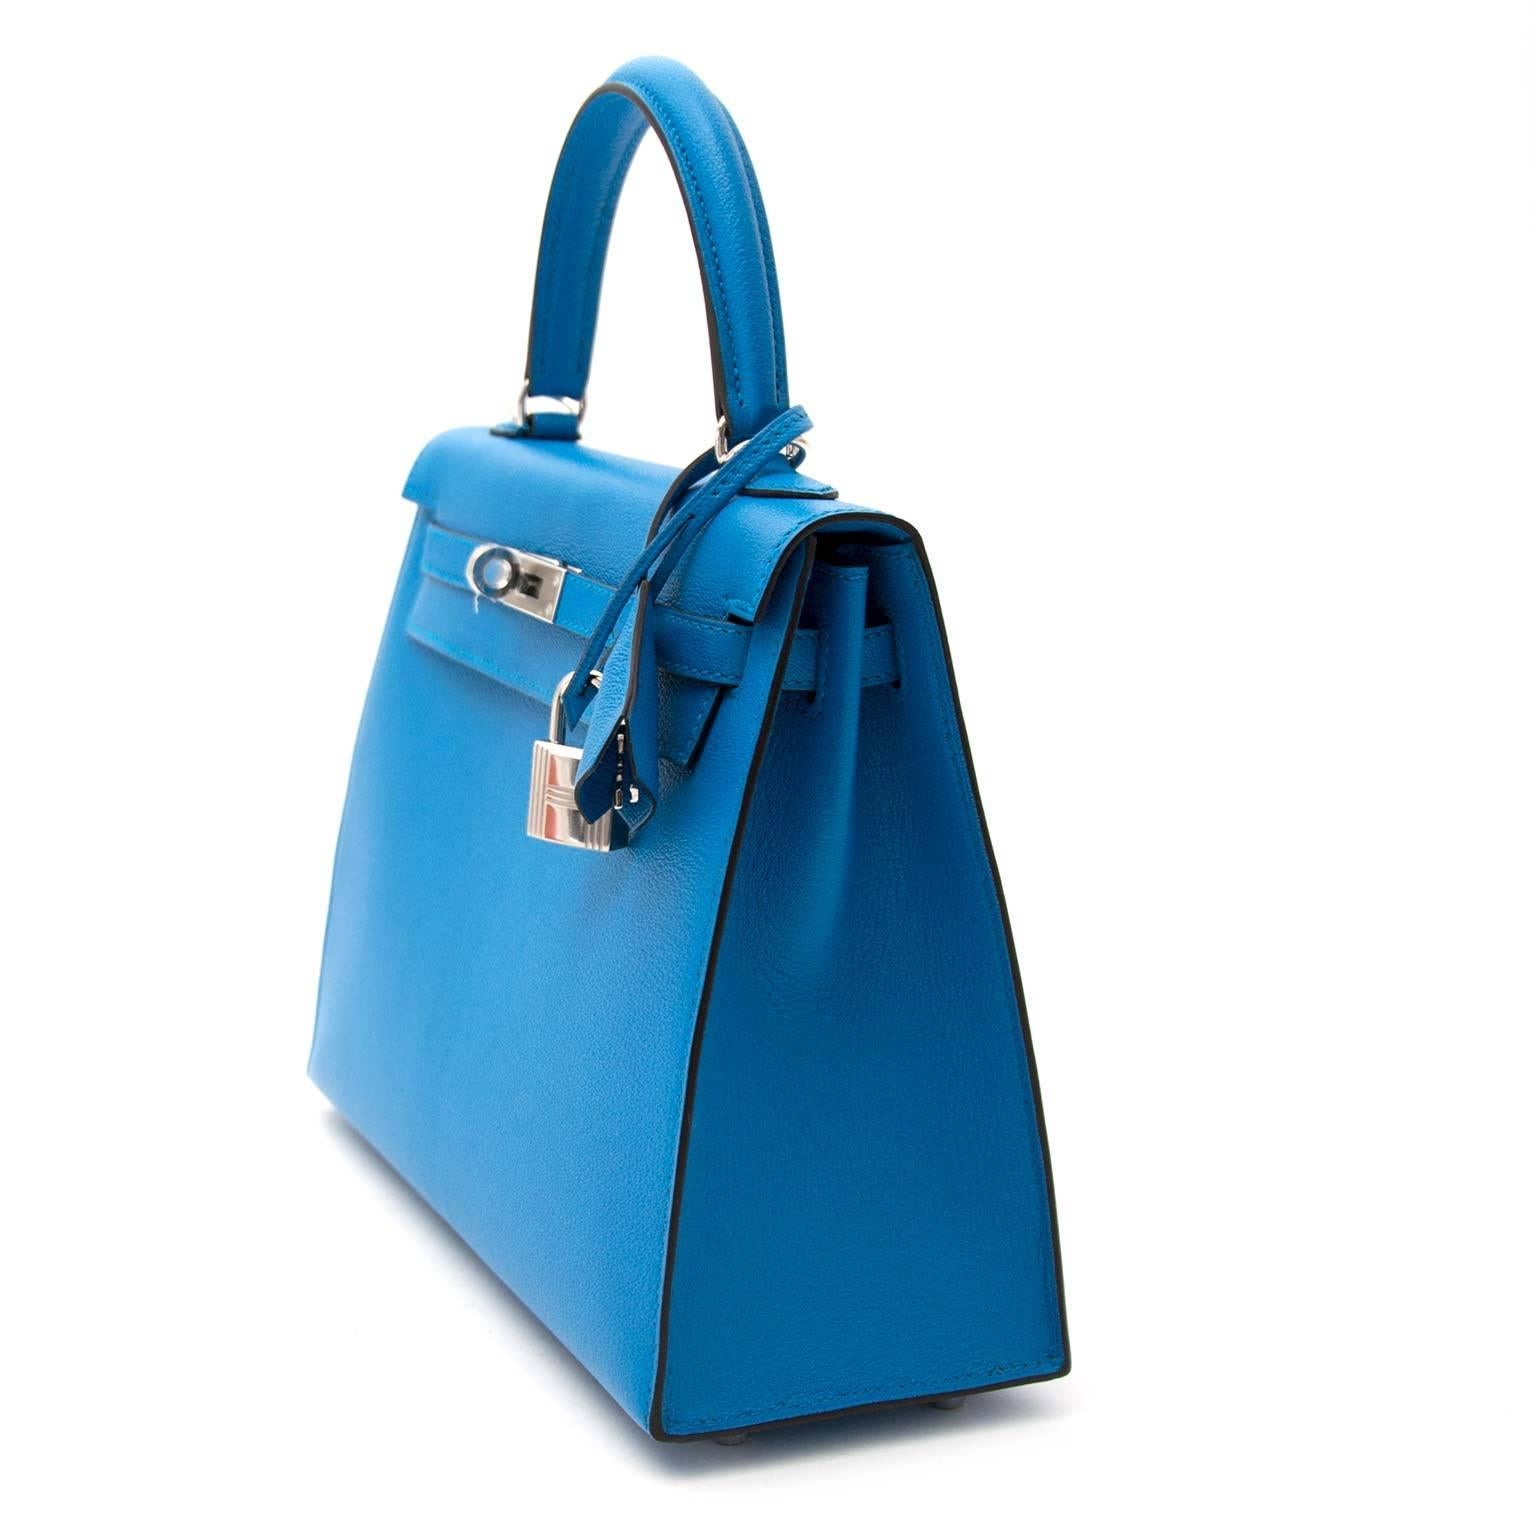 6ba335cee4ba Hermès Kelly 25 Zanzibar PHW Bag at 1stdibs